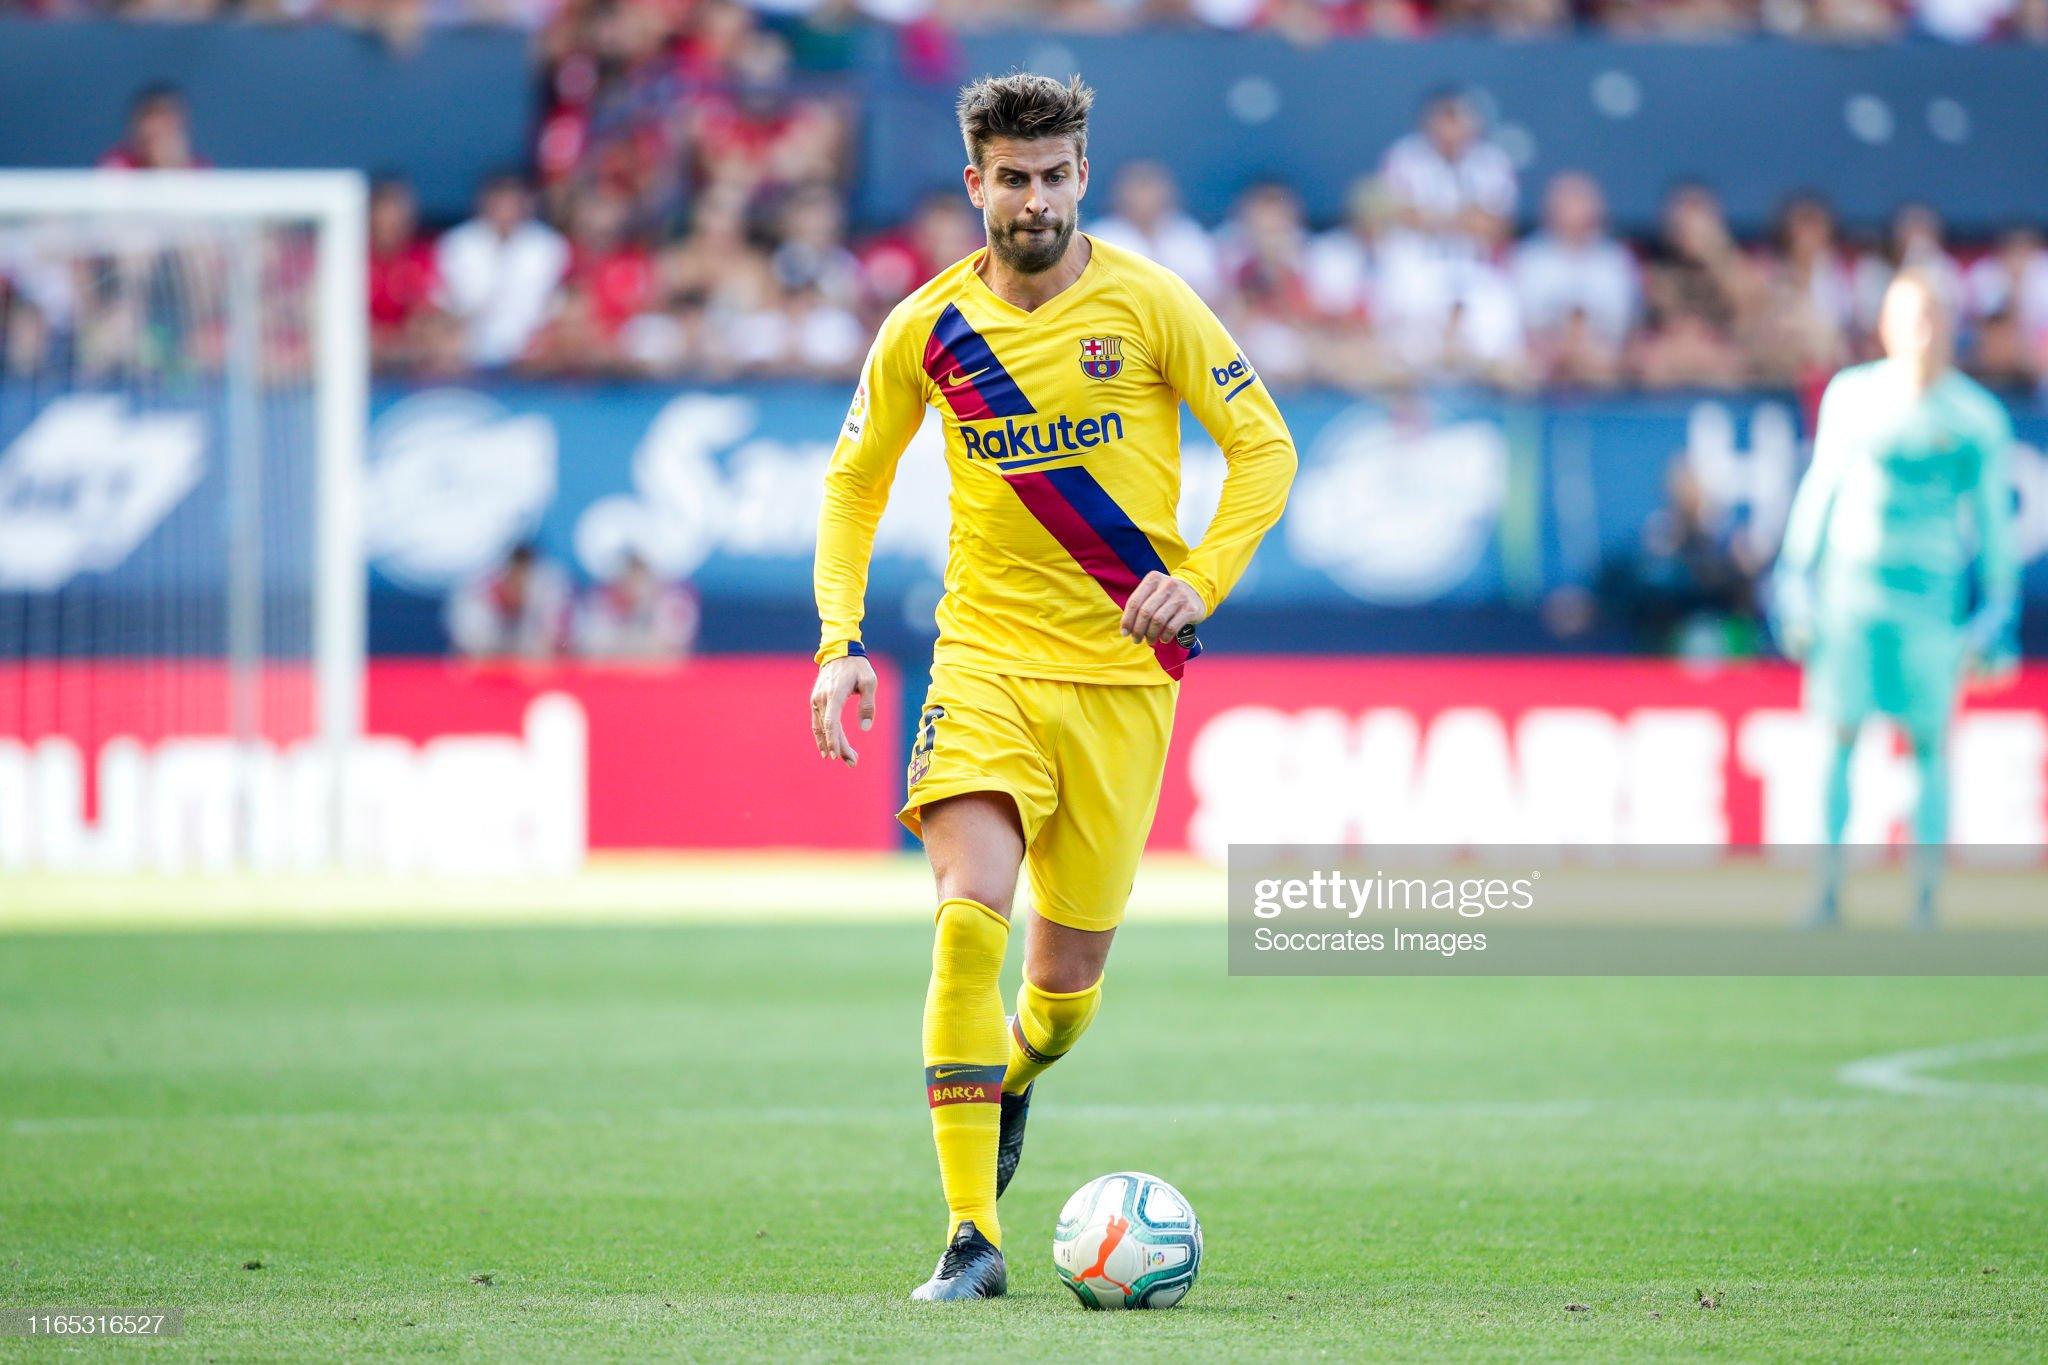 صور مباراة : أوساسونا - برشلونة 2-2 ( 31-08-2019 )  Gerard-pique-of-fc-barcelona-during-the-la-liga-santander-match-v-picture-id1165316527?s=2048x2048